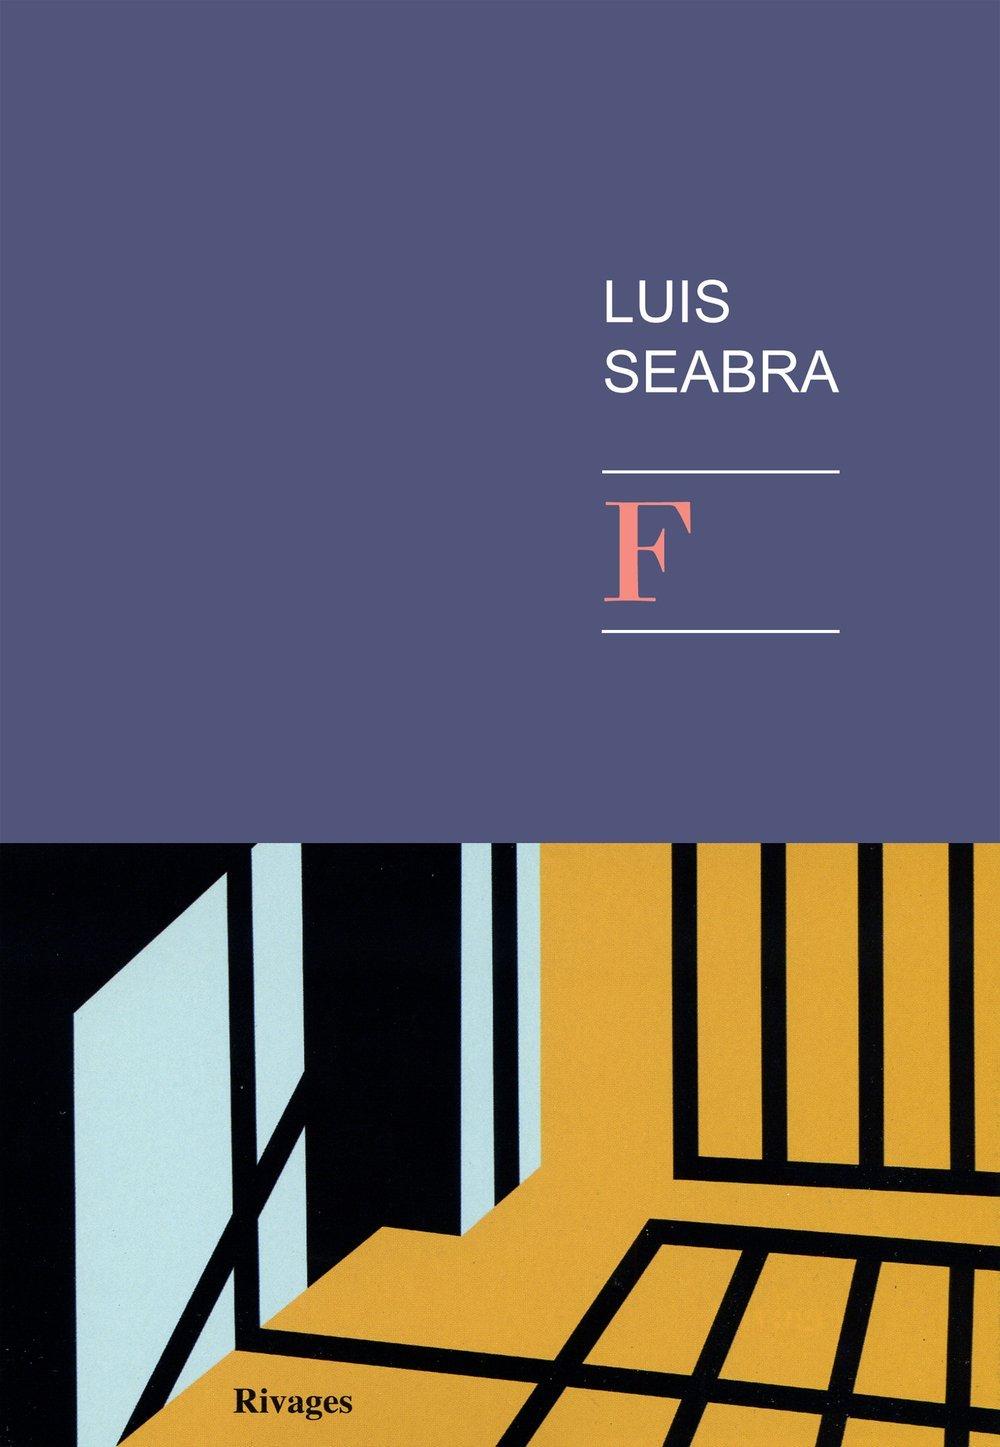 F-Luis Seabra